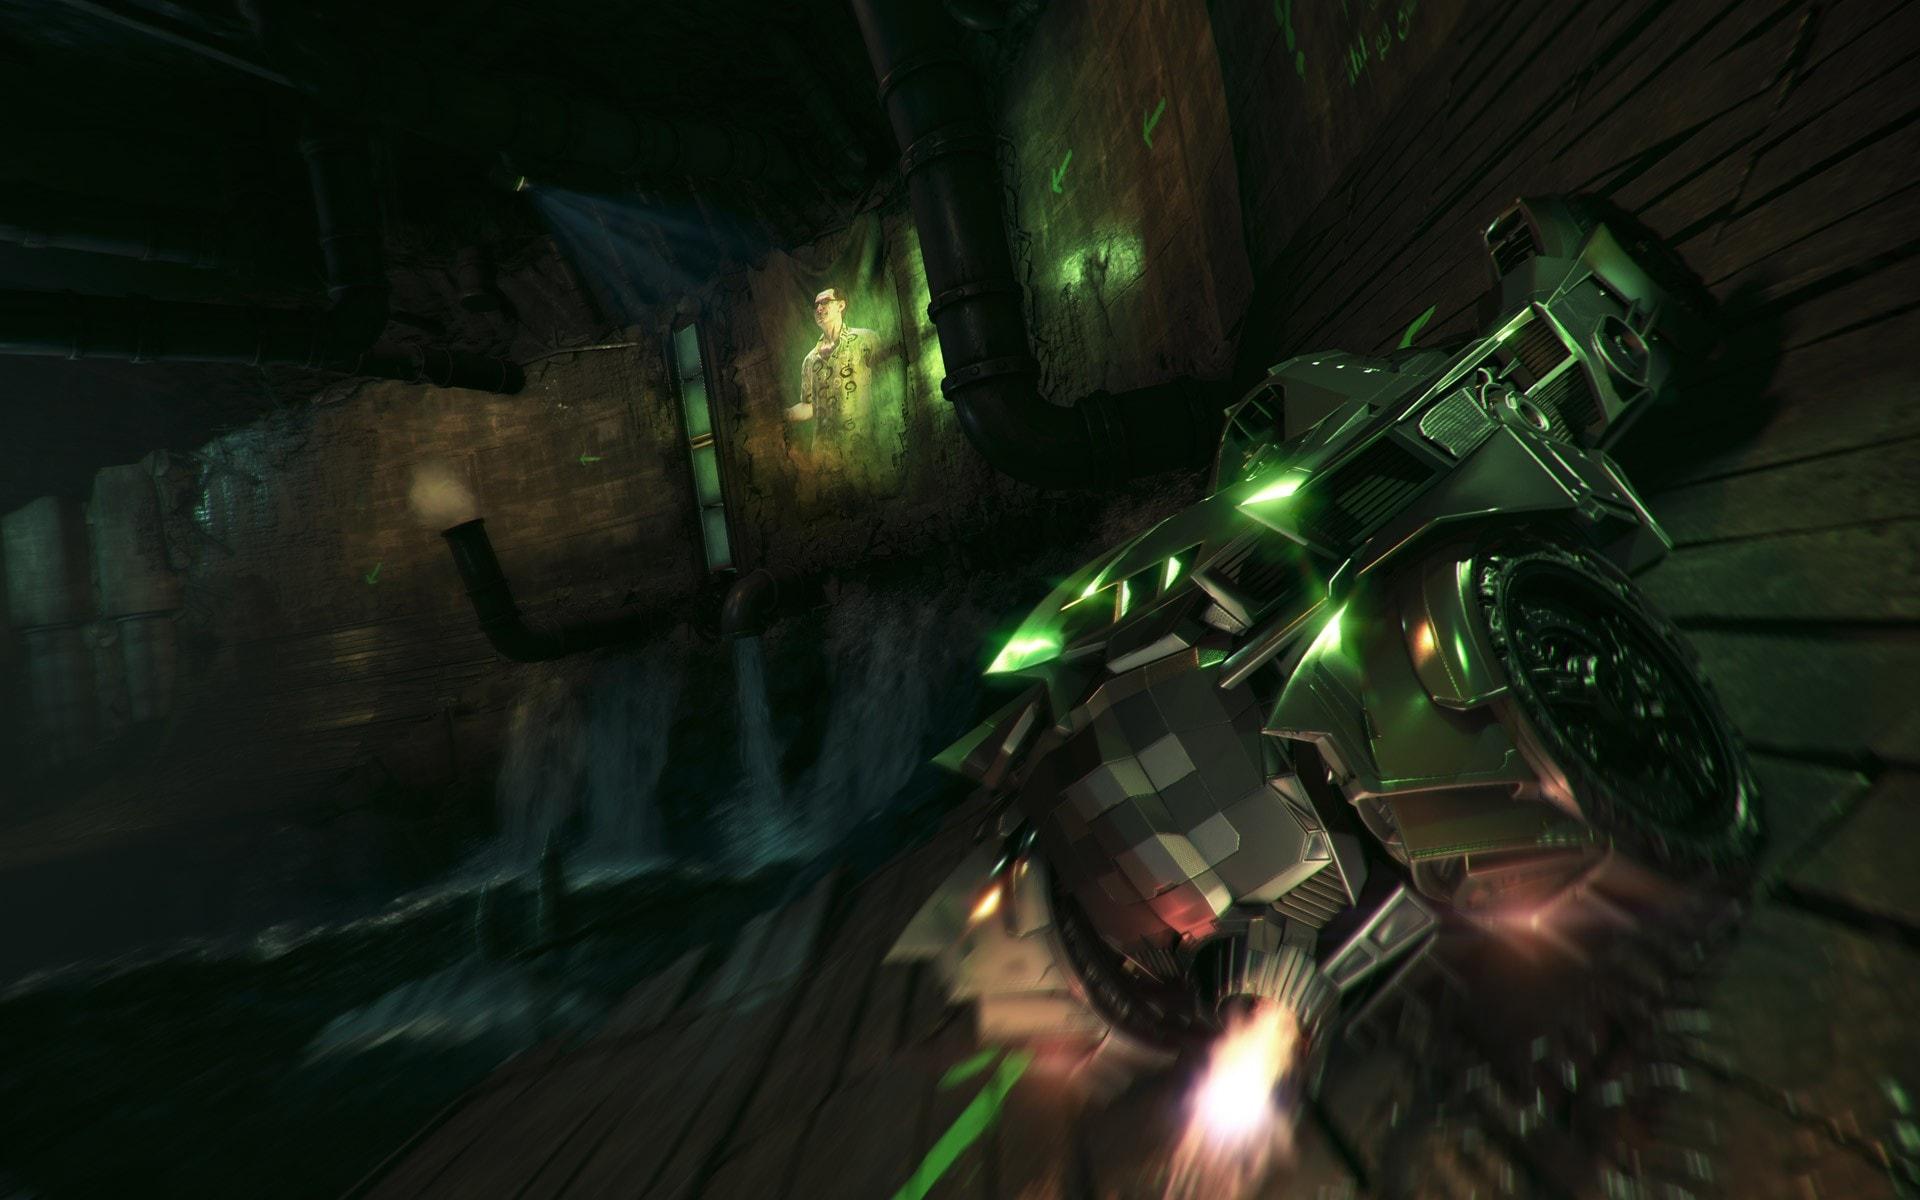 Batman: Arkham Knight Steam Key RU/CIS - 4